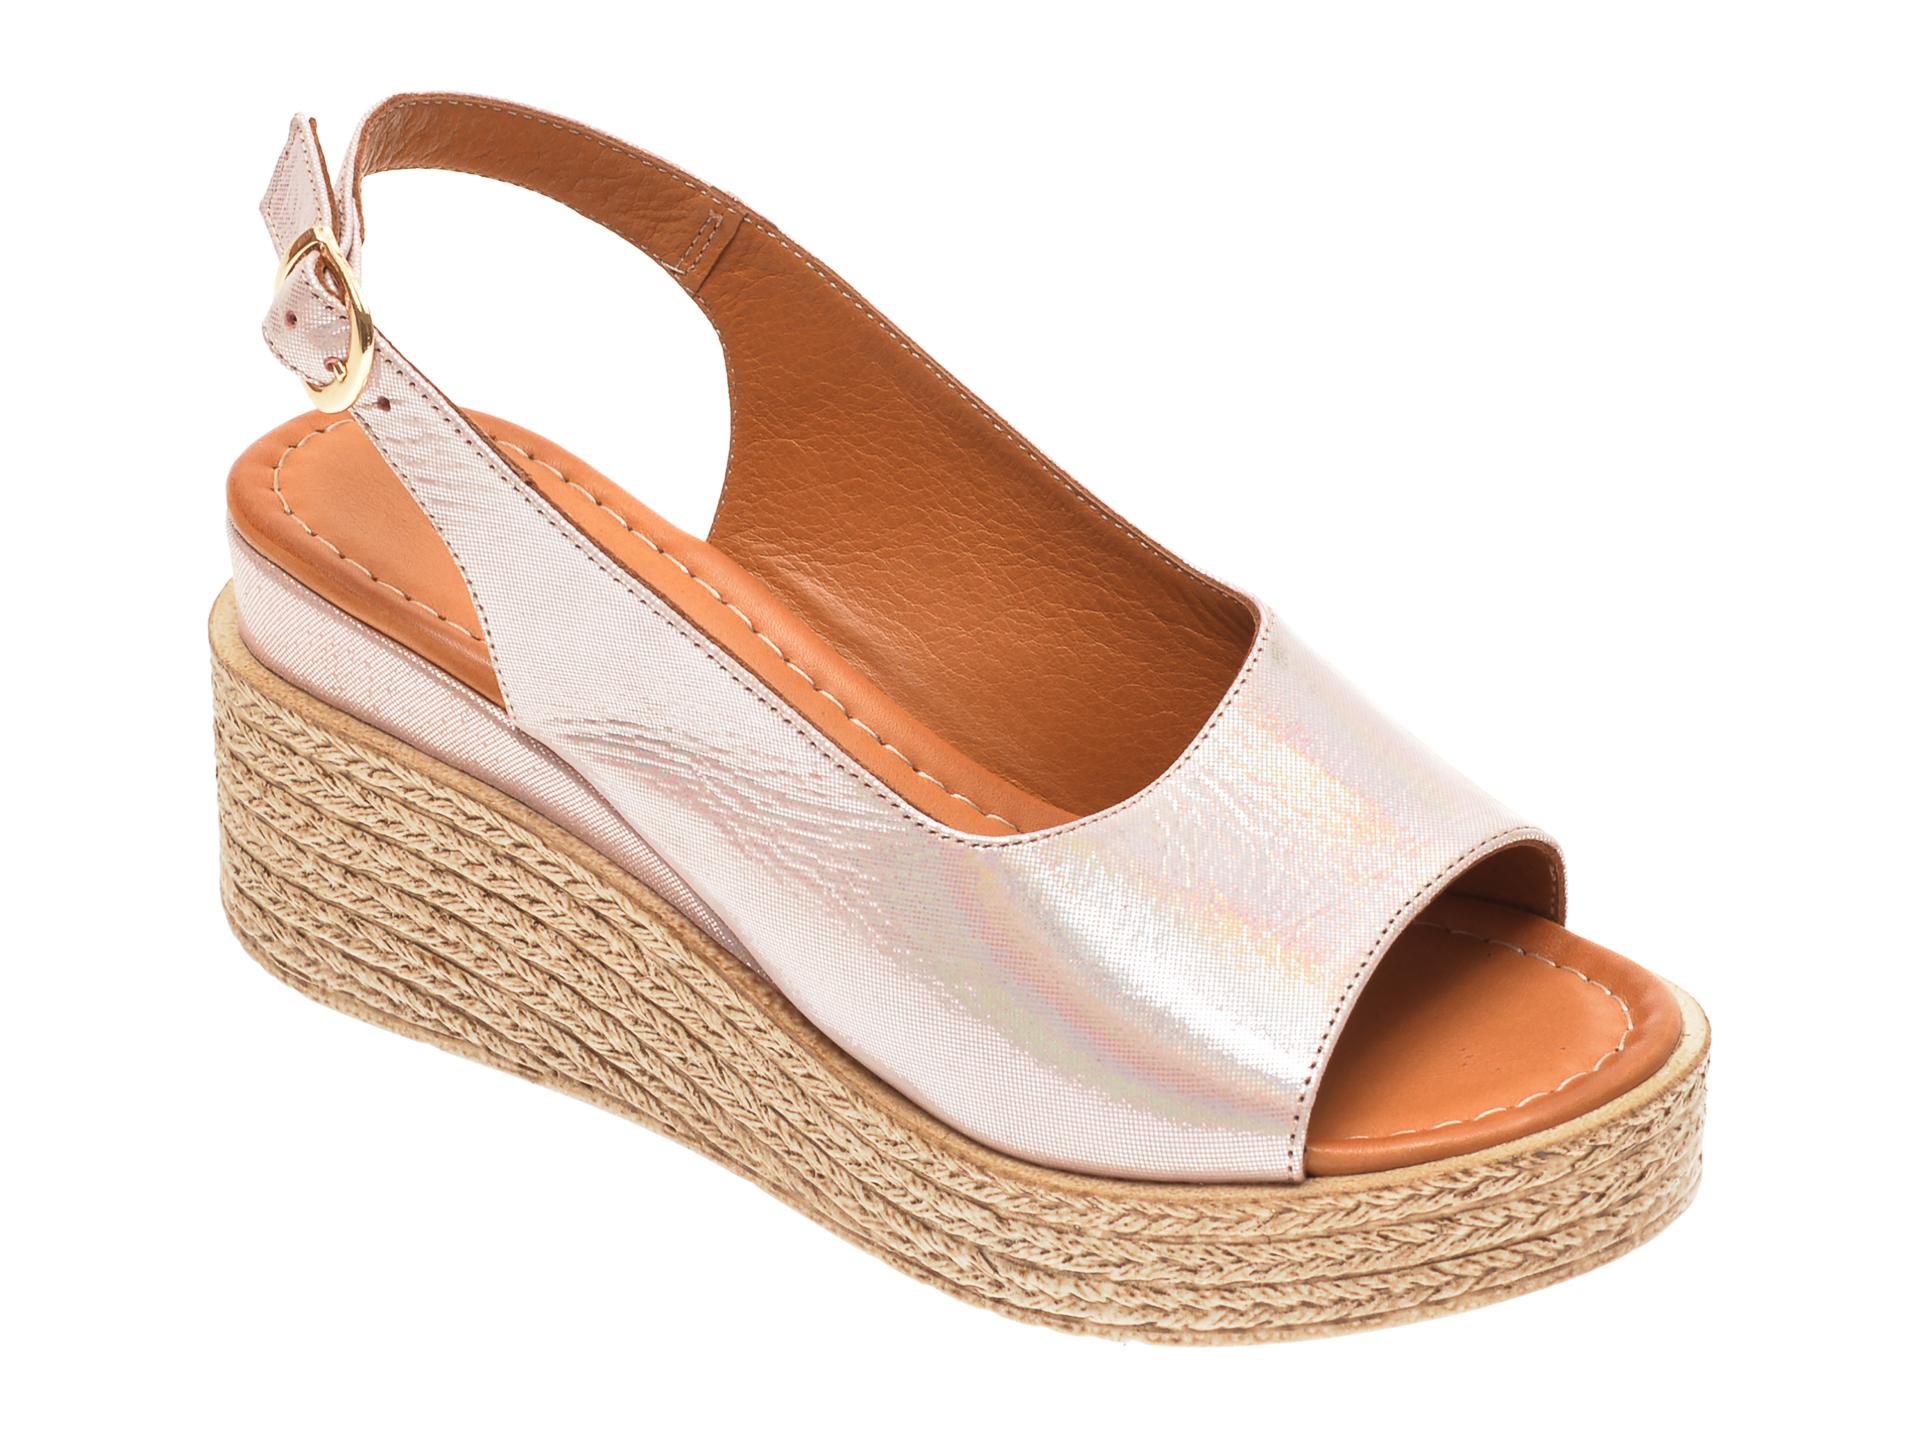 Sandale FLAVIA PASSINI nude, 1182734, din piele naturala